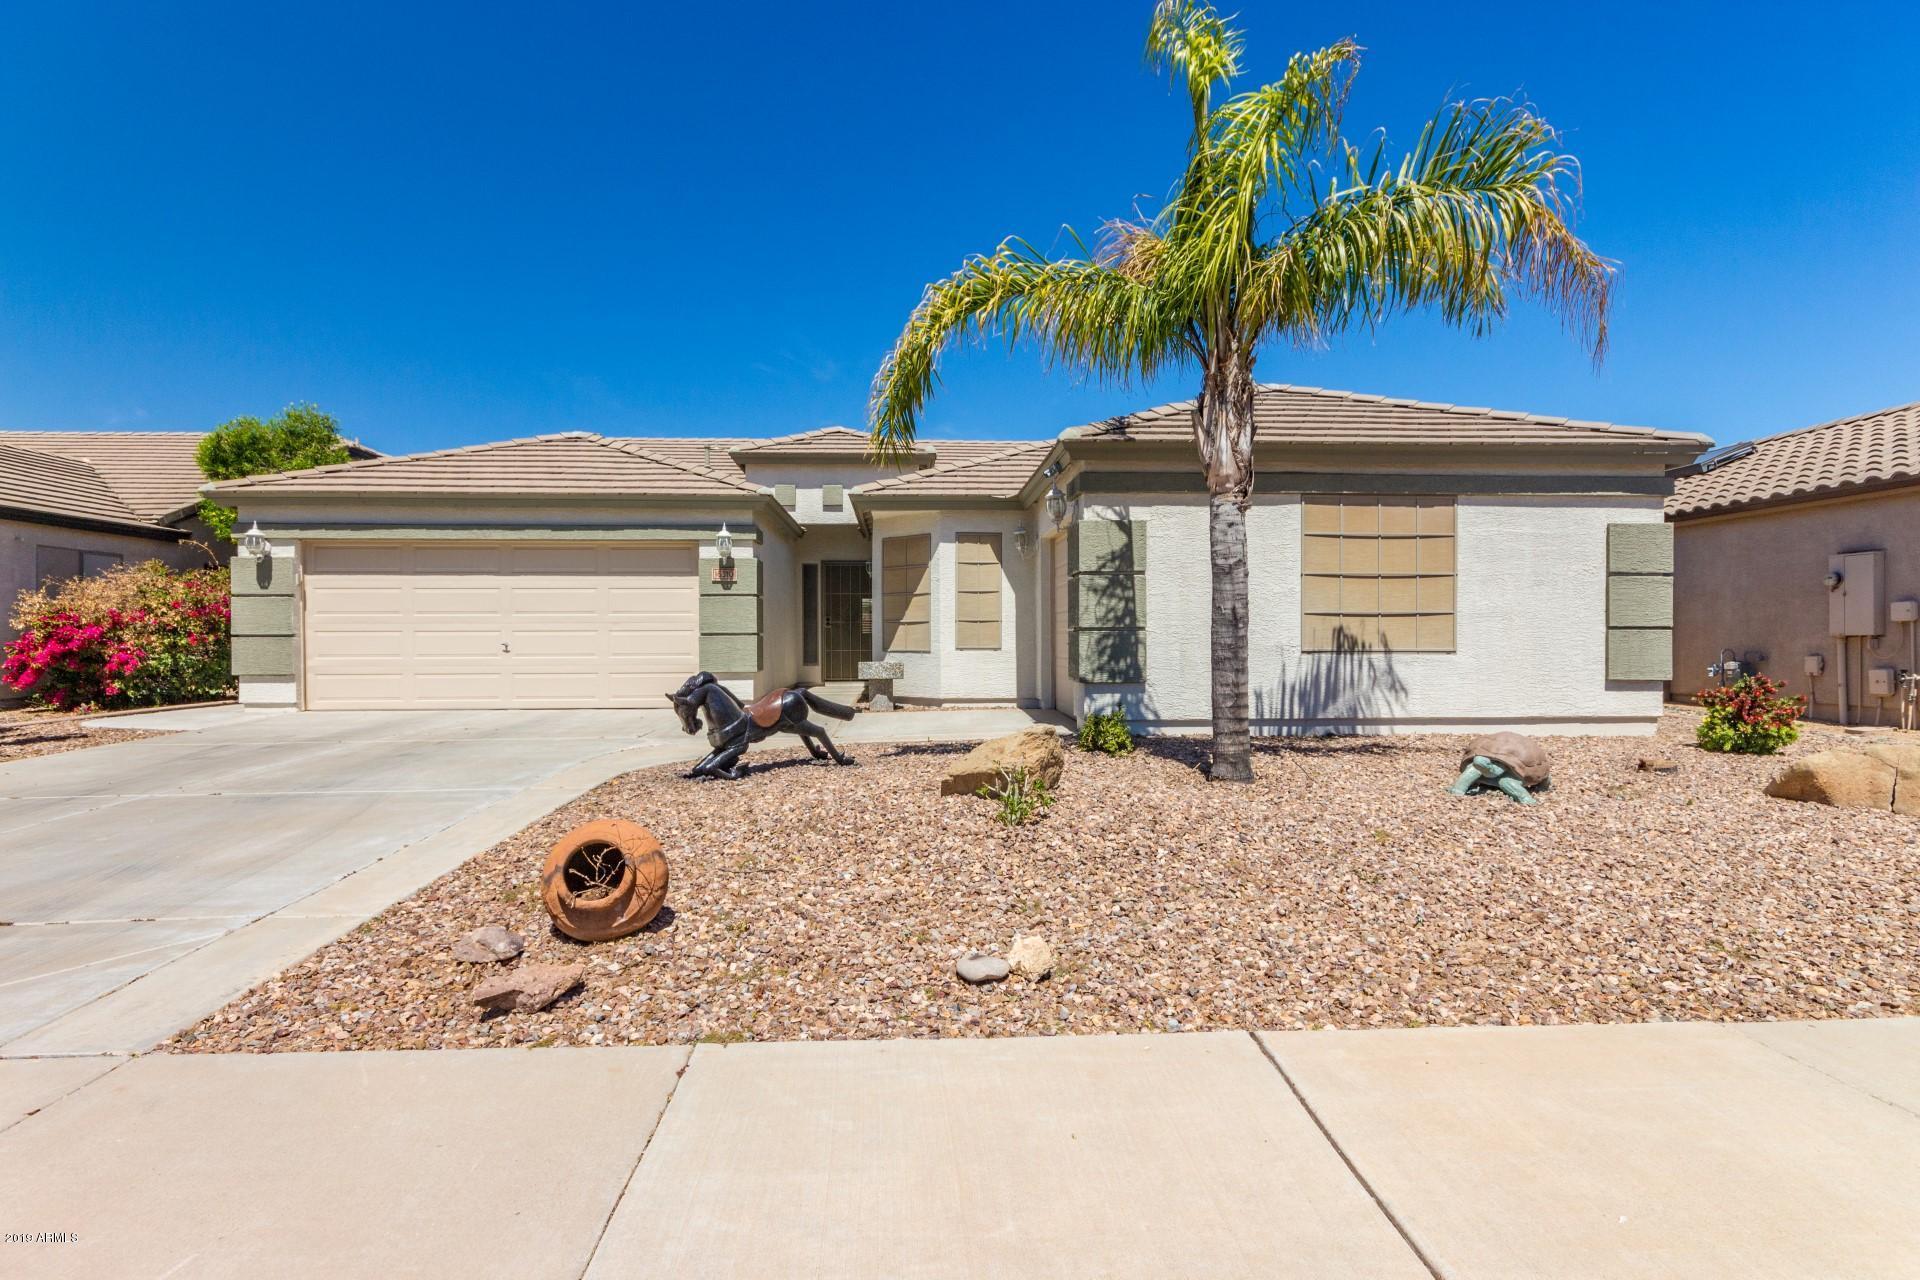 16310 W IRONWOOD Street, Surprise, Arizona